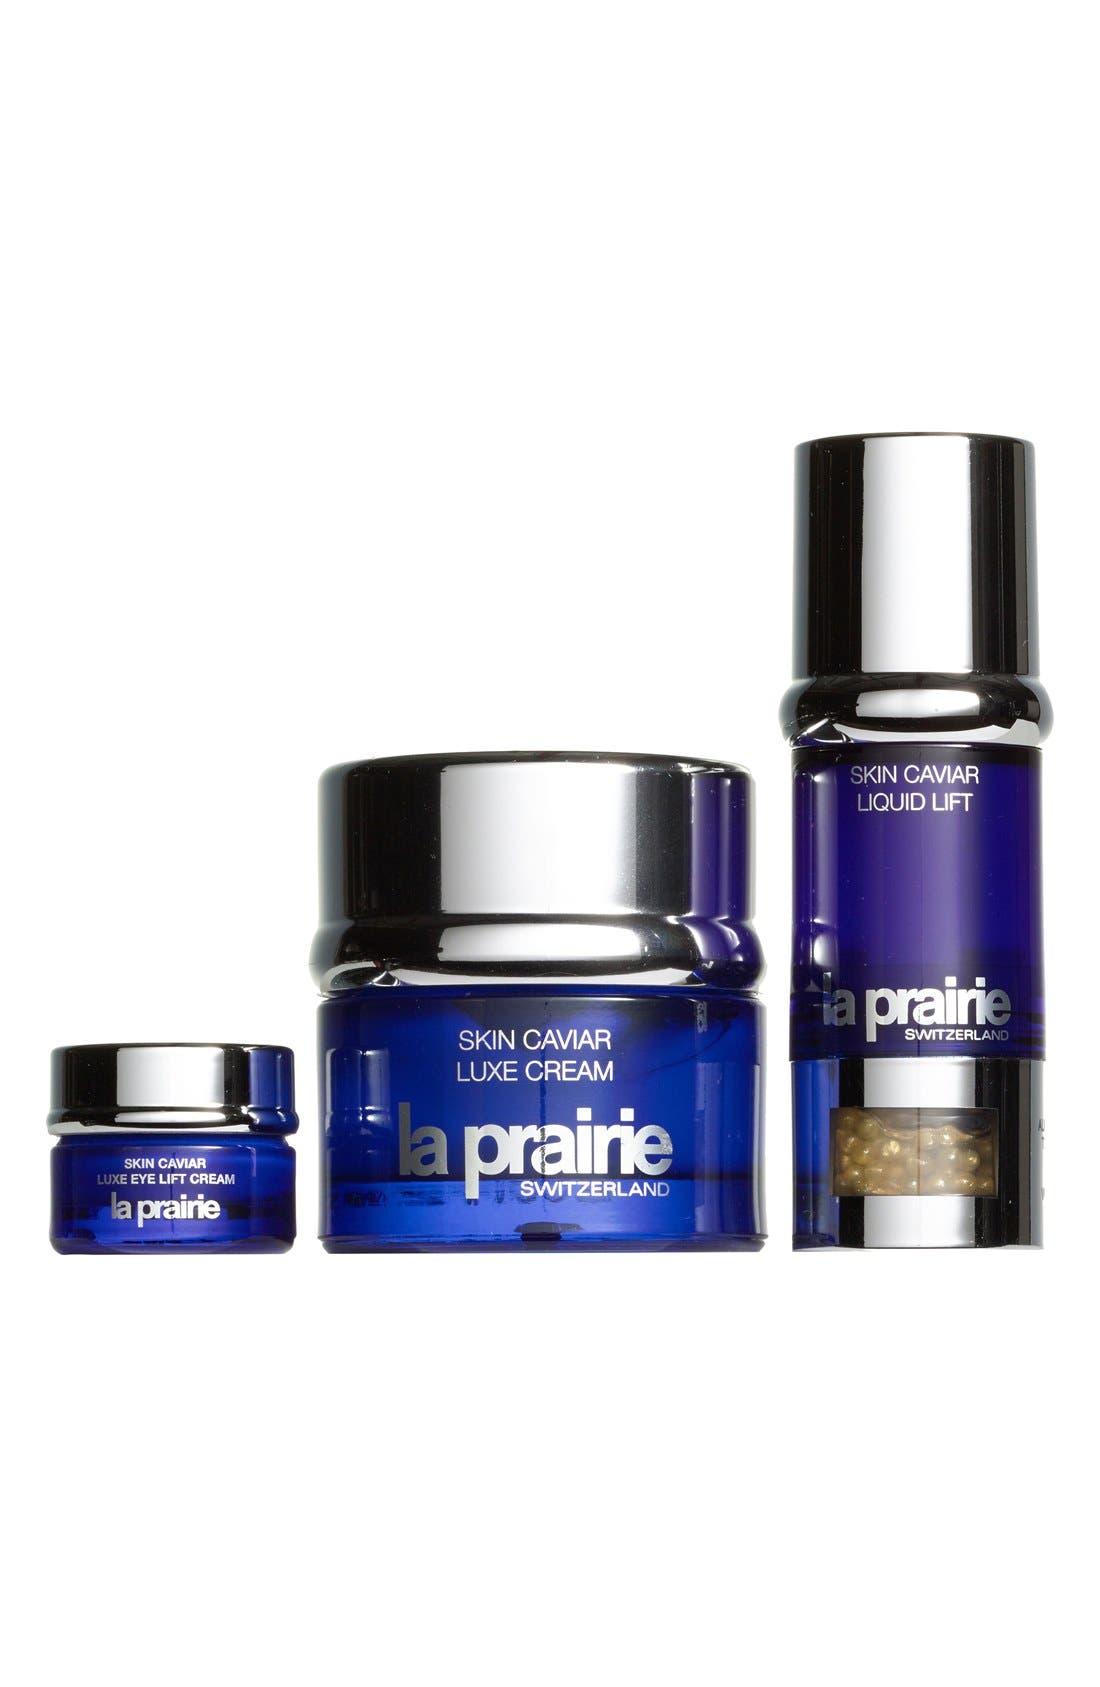 La Prairie 'Caviar Legends' Set ($384 Value)